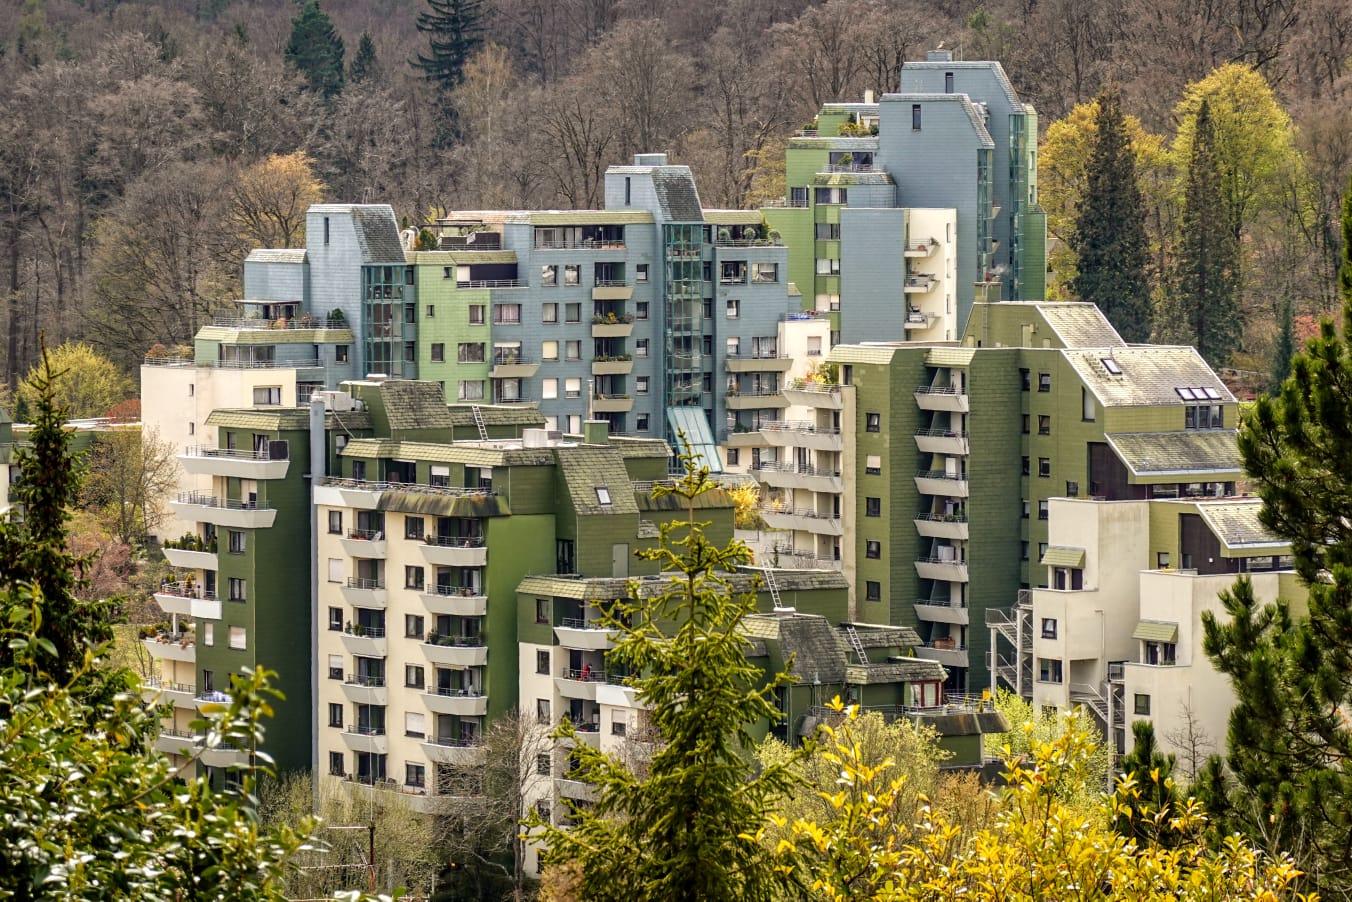 Hautes-Alpes 46